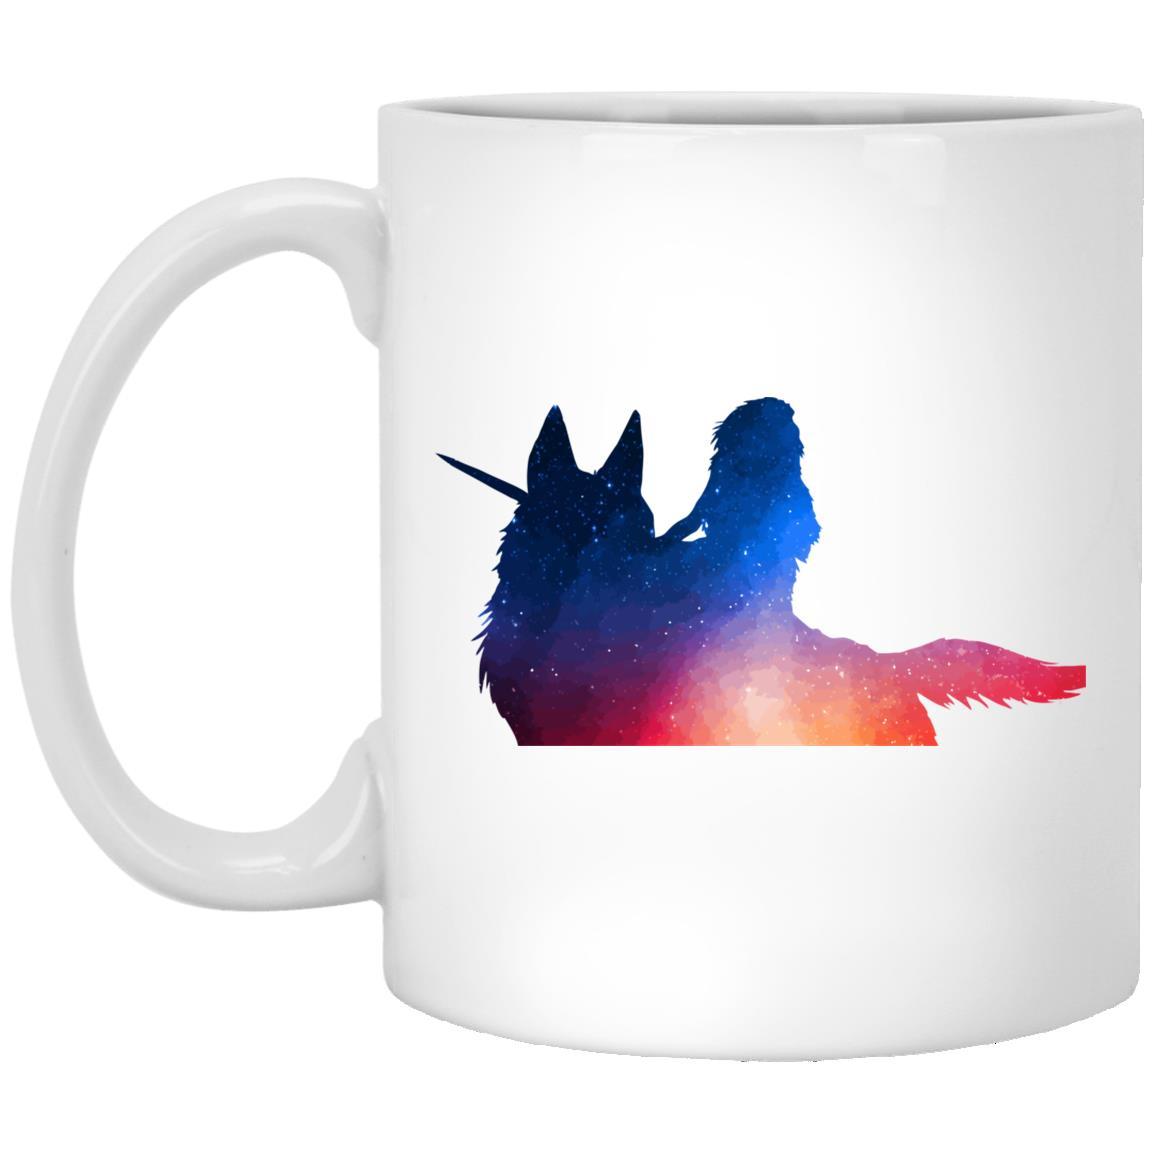 Princess Mononoke Rainbow Style Mug